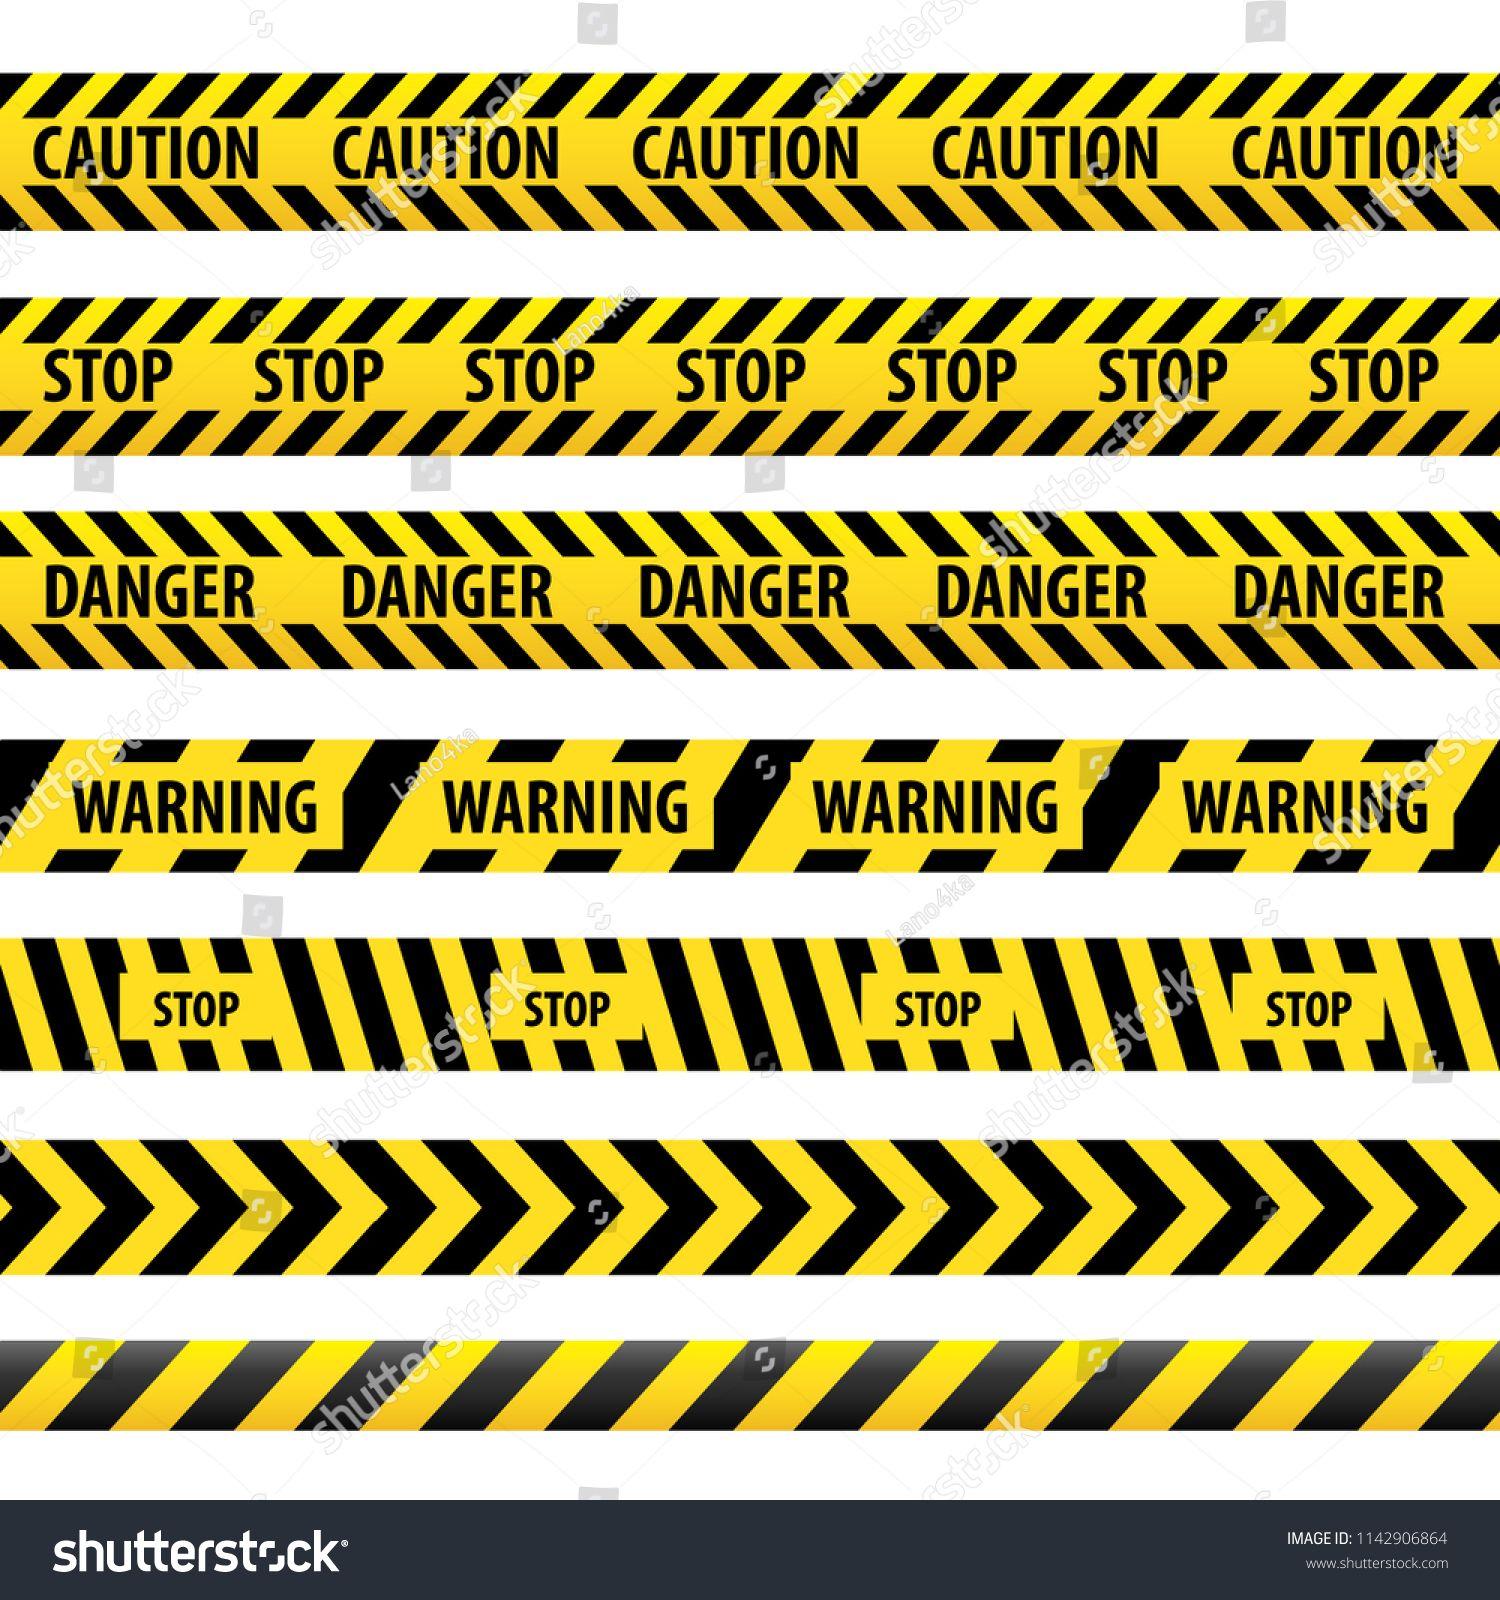 Seamless Tape Caution Danger Illustration Yellow Police Line Warning Tape Danger Tape Caution Tape Caution Da Vector Illustration Dangerous Illustration